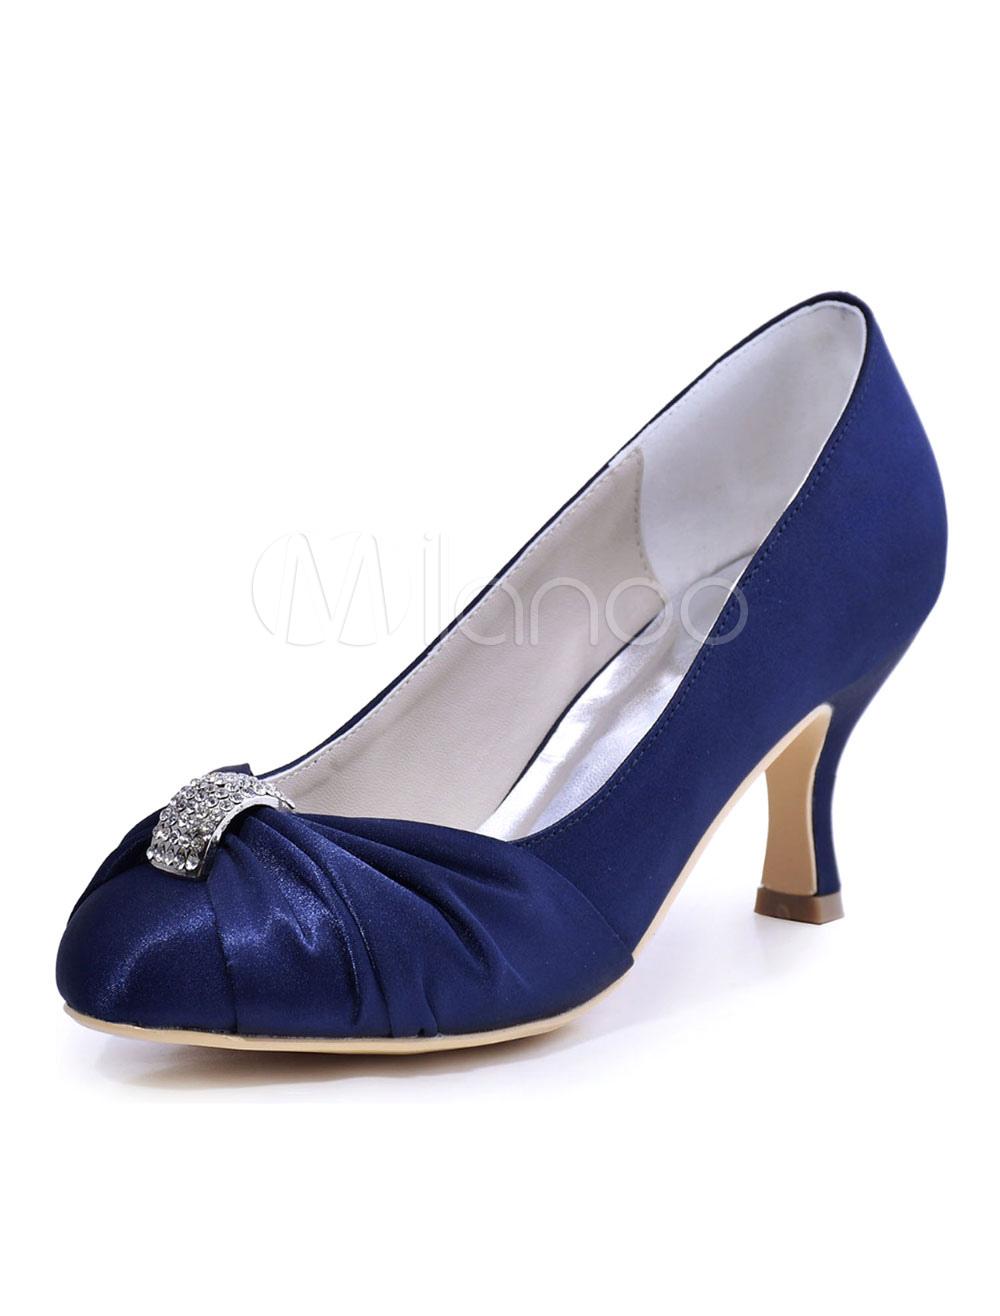 Women's Wedding Shoes Deep Blue Round Toe Ruched Rhinestones Slip On Bridal Pumps